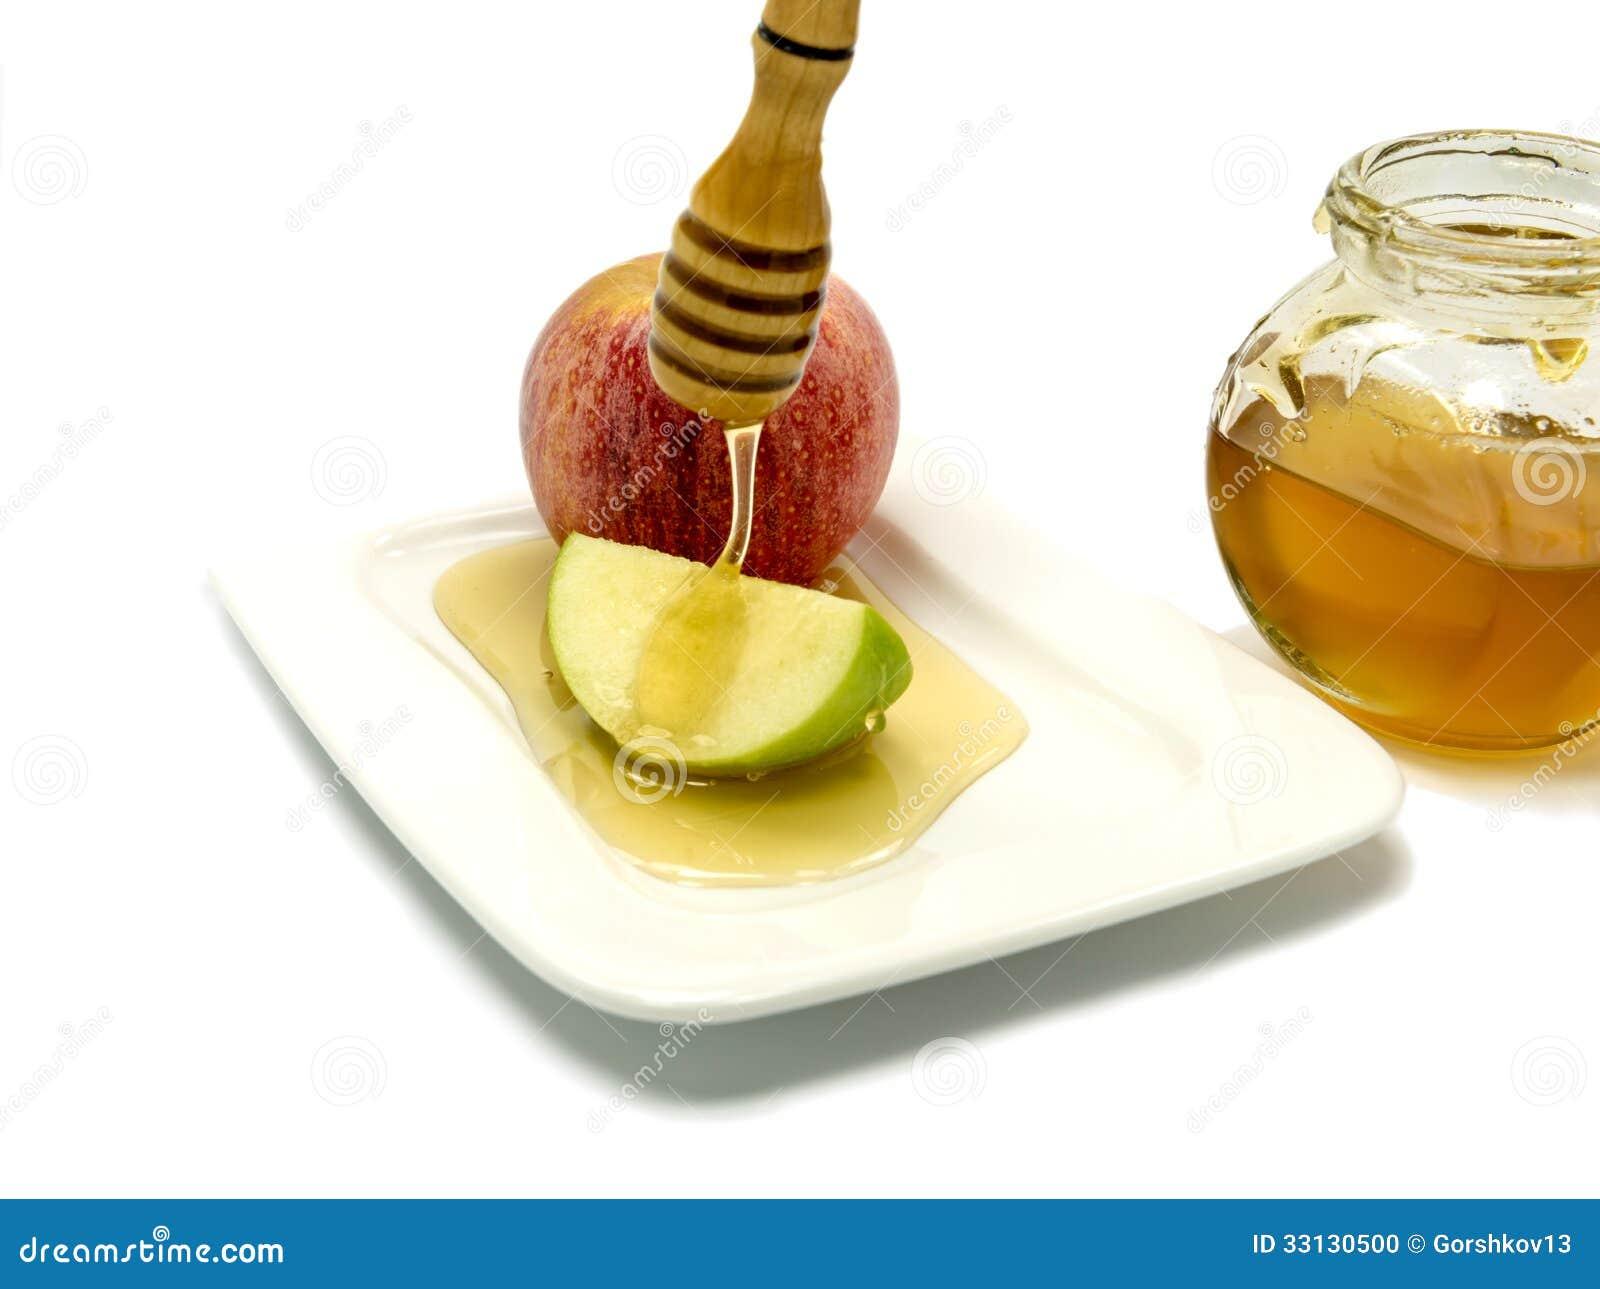 Symbolism of apples